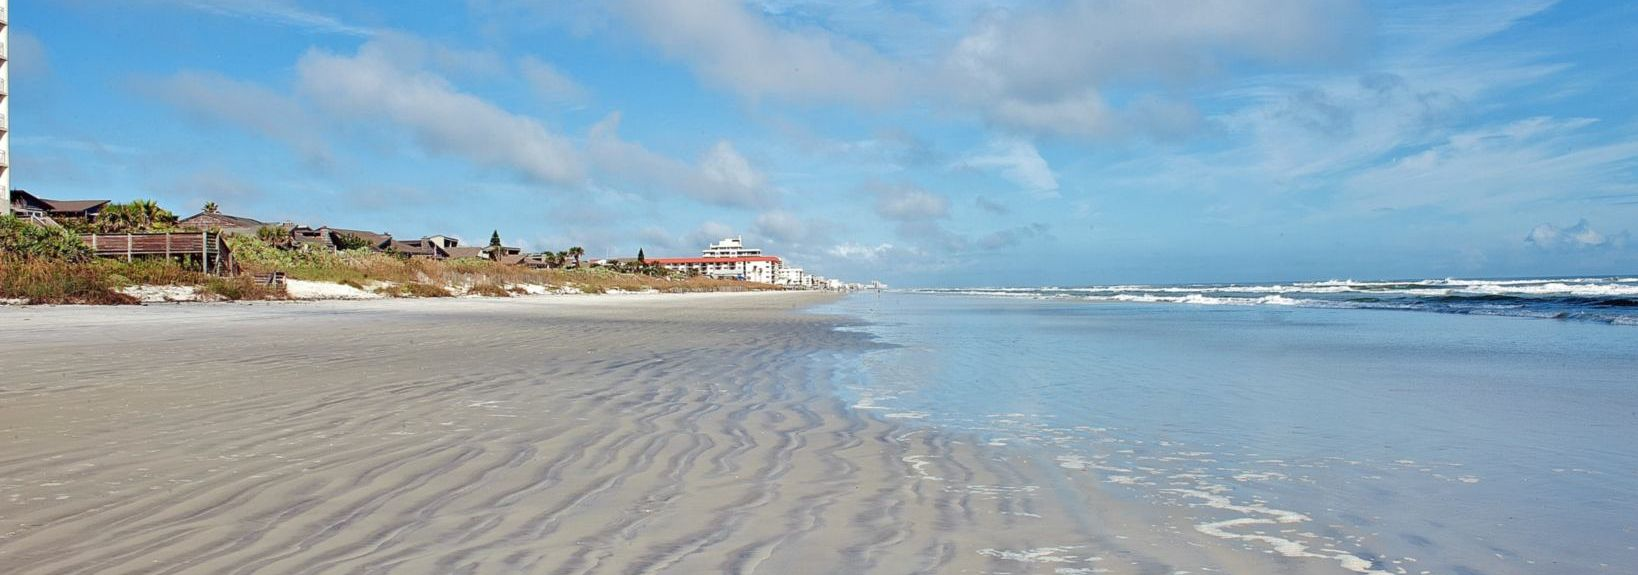 Sea Villas New Smyrna Beach Holiday